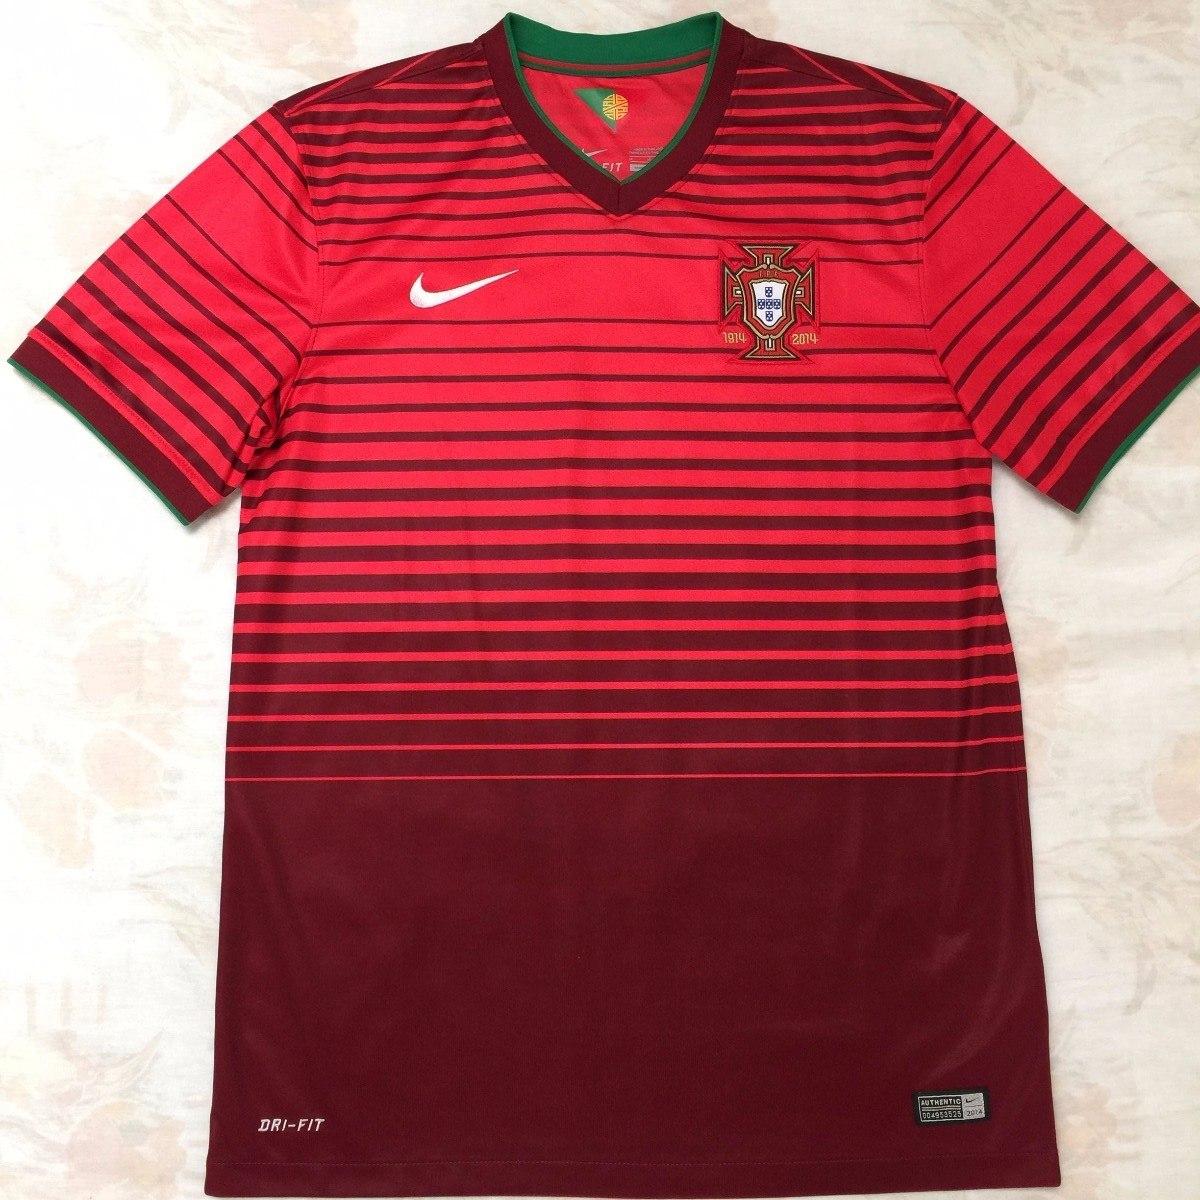 577986-677 Camisa Nike Portugal Home 2014 M Fn1608 - R  1.999 64ae1c901e80e